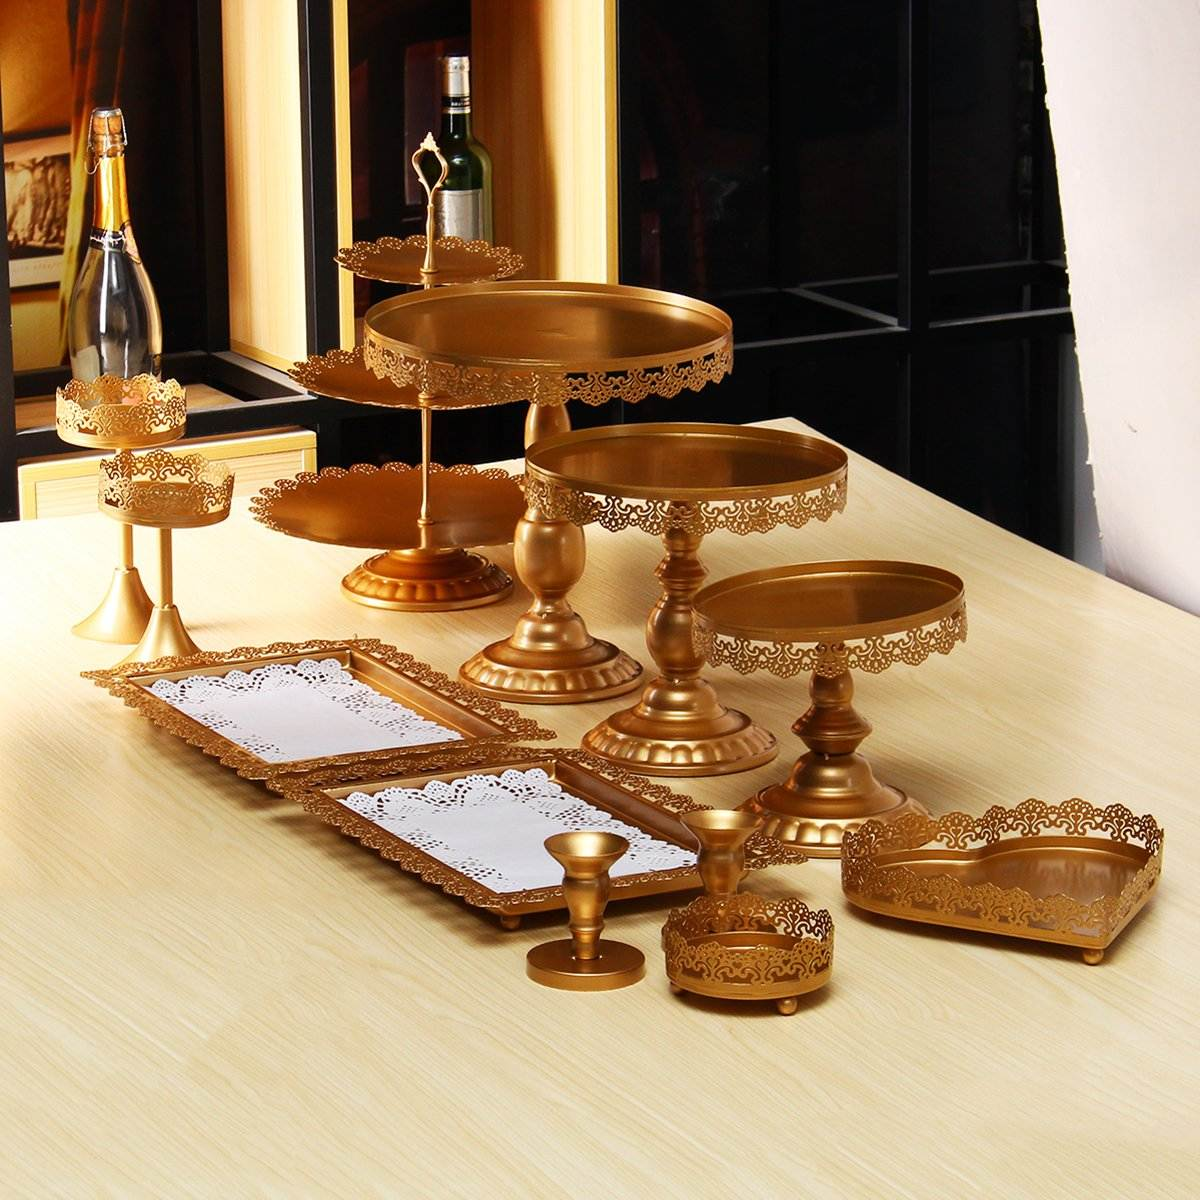 Vintage Metal Iron Cake Stands Cupcake Dessert Display Tray Holder Serving Rack Party Wedding Decorations Gifts 12Pcs/Set